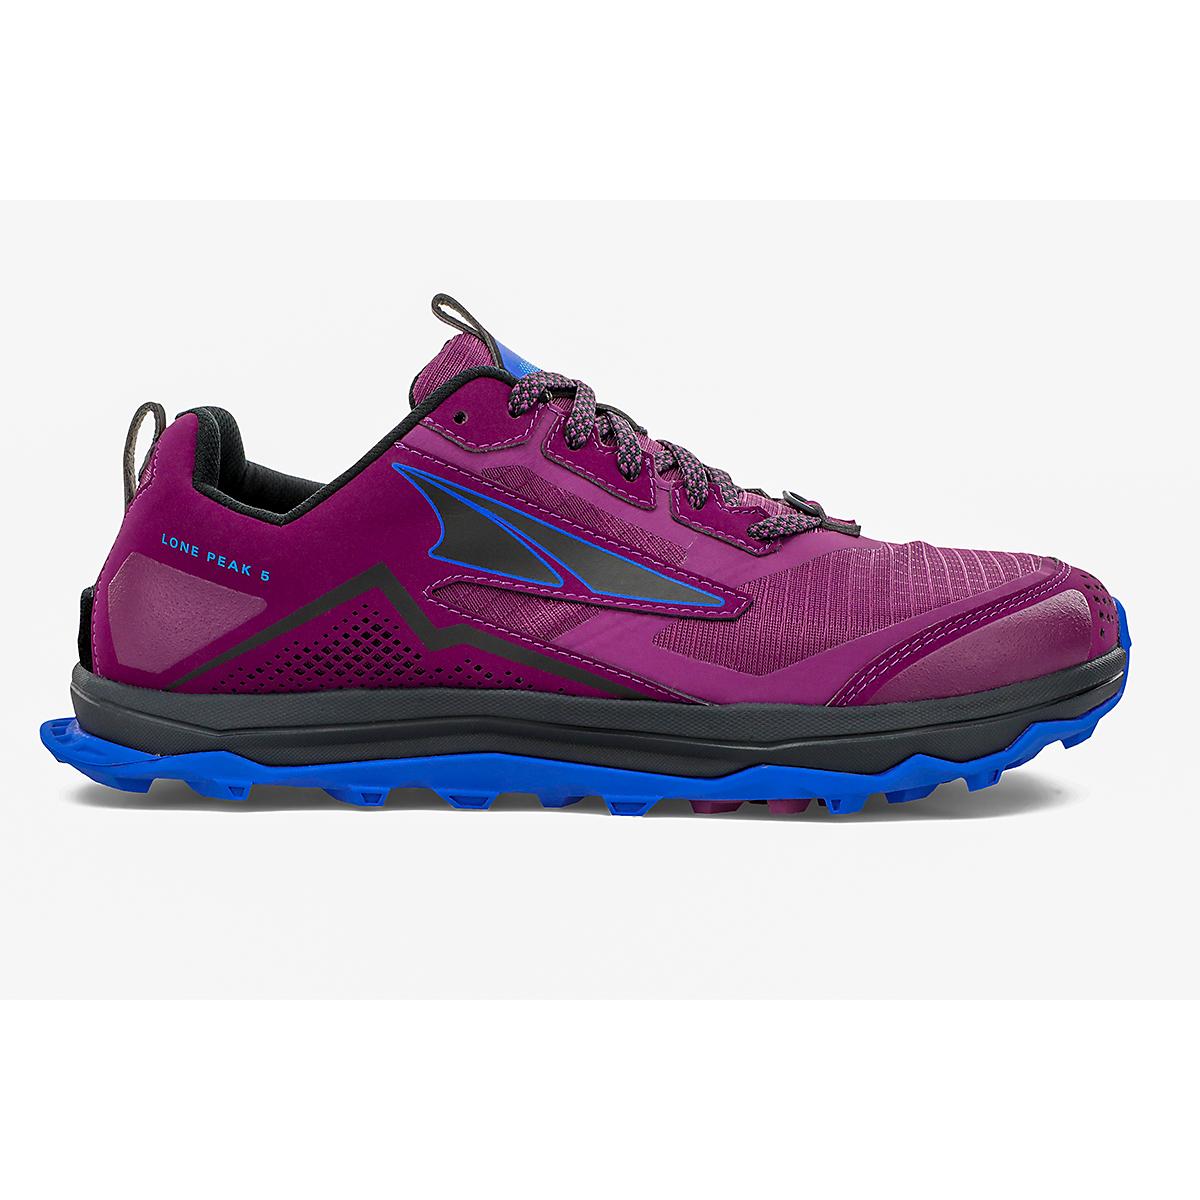 Women's Altra Lone Peak 5 Trail Running Shoe - Color: Plum - Size: 5.5 - Width: Regular, Plum, large, image 1